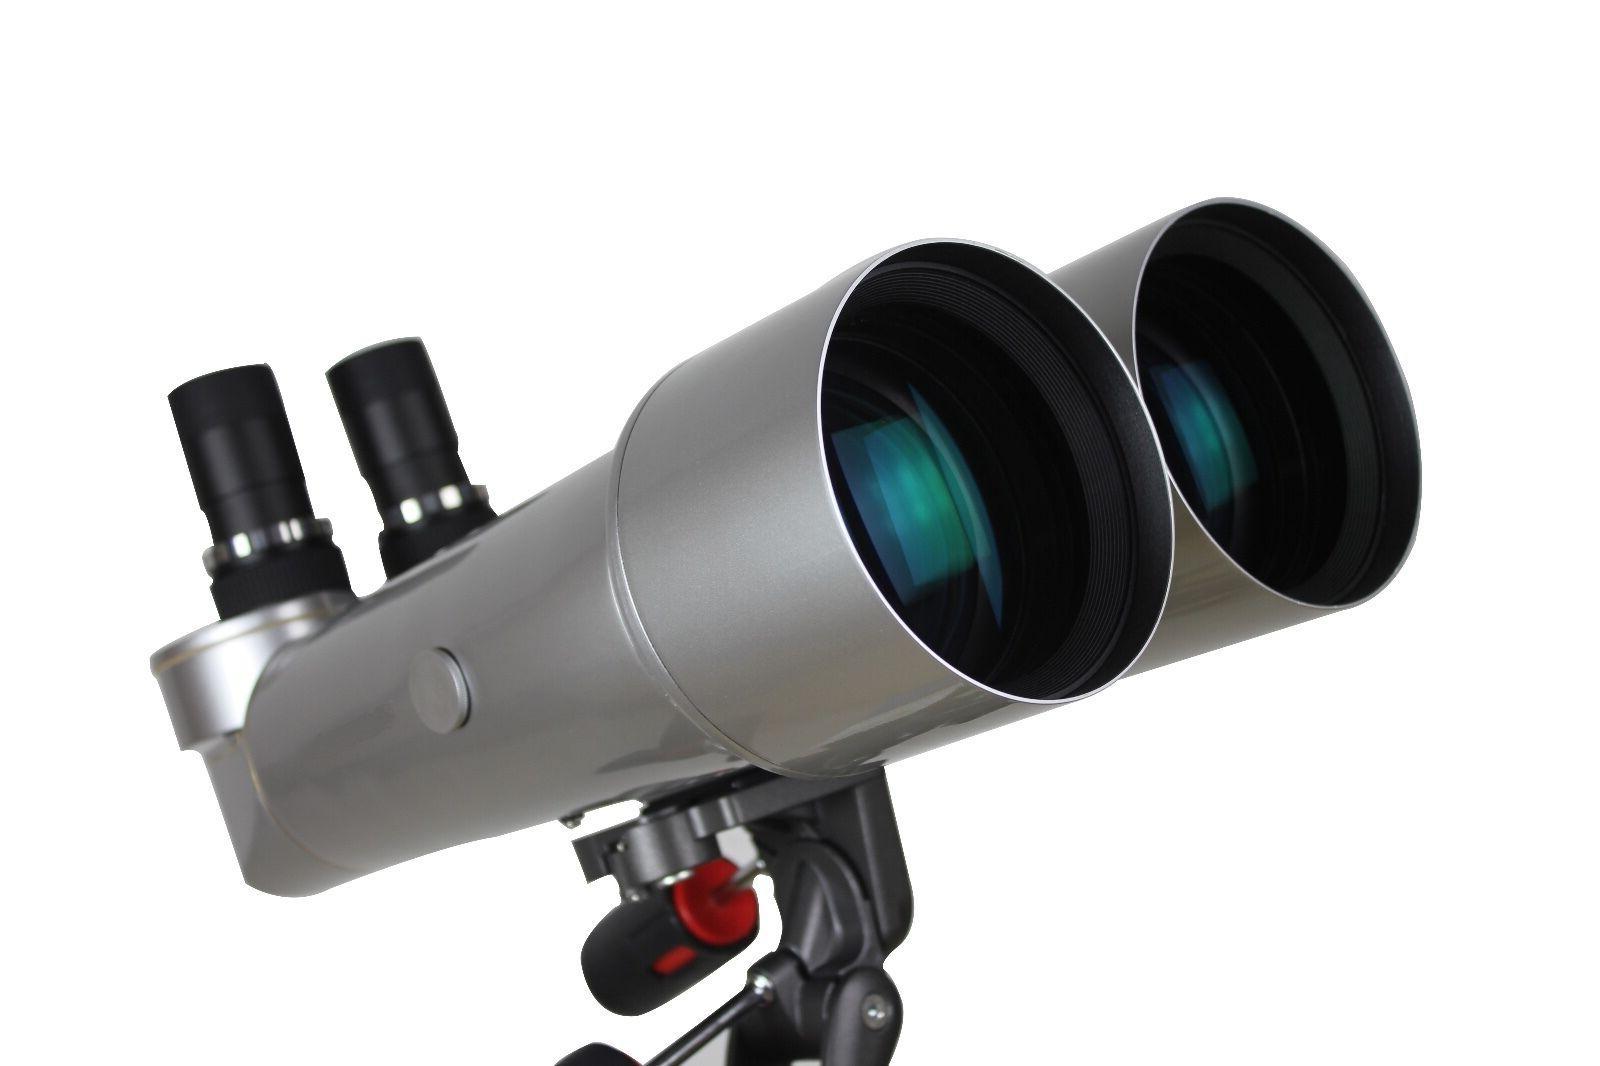 Binger 20x100 mm astronomical binoculars